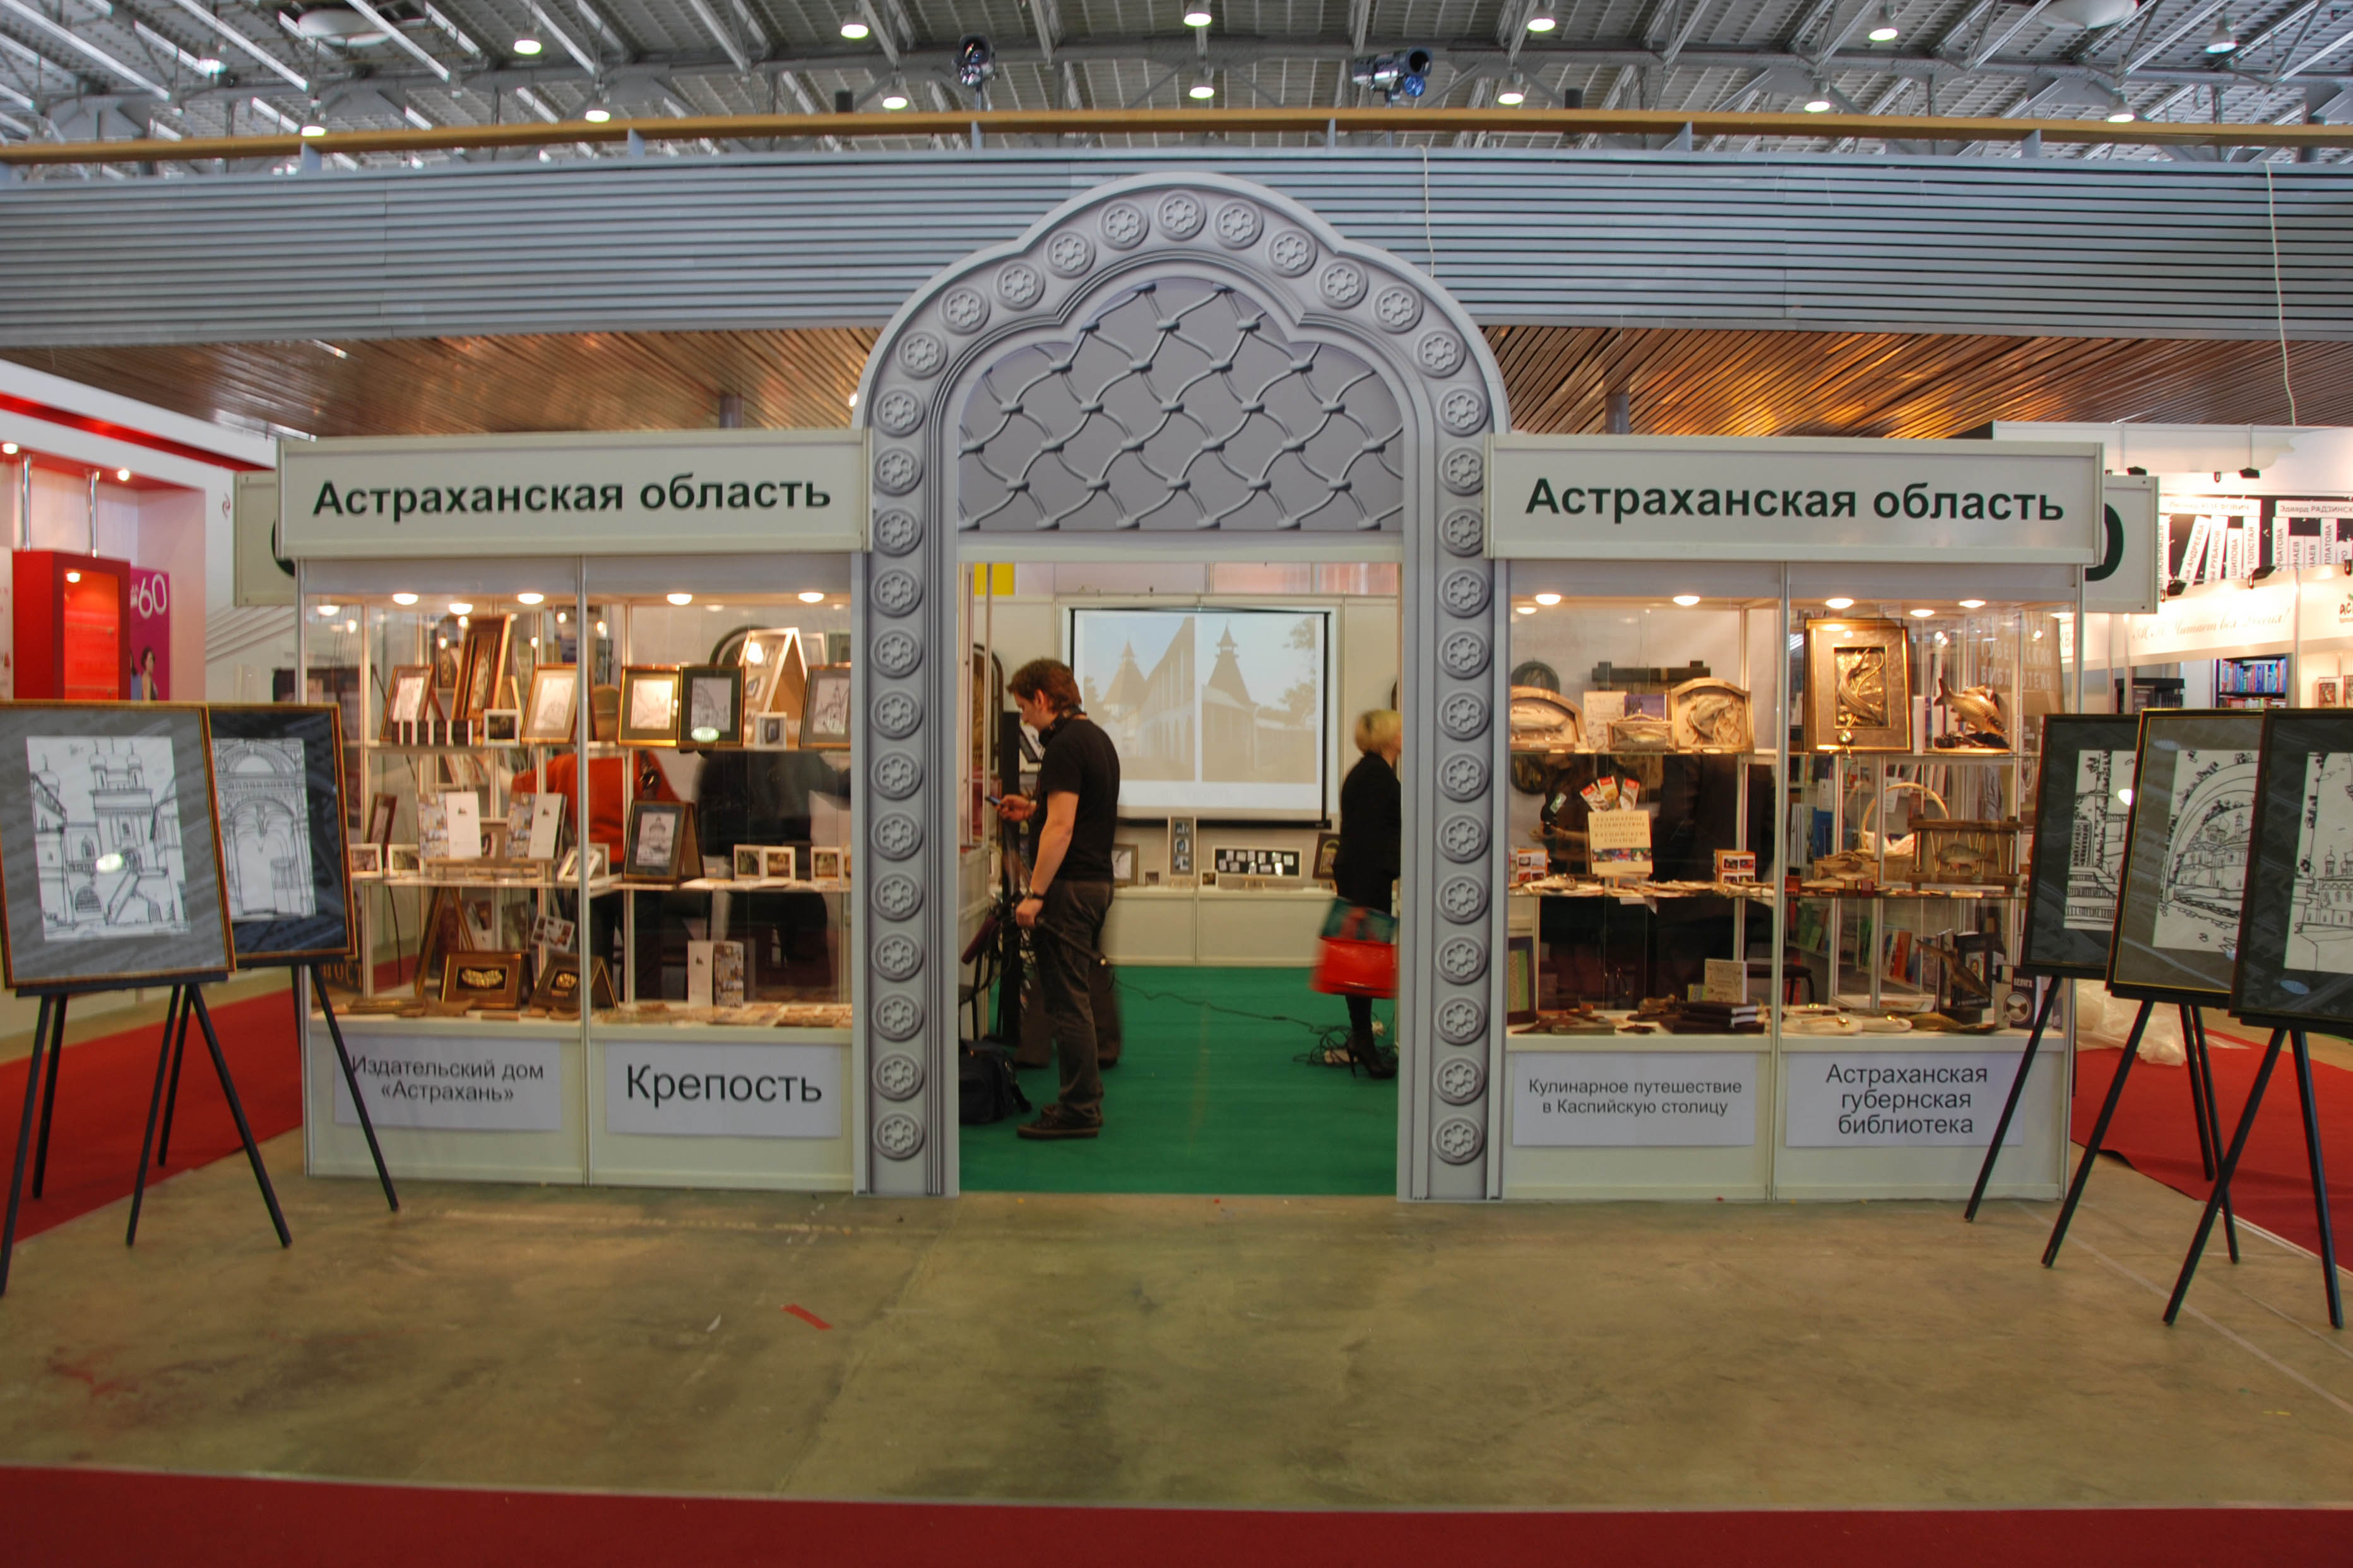 Павильон Астраханской области